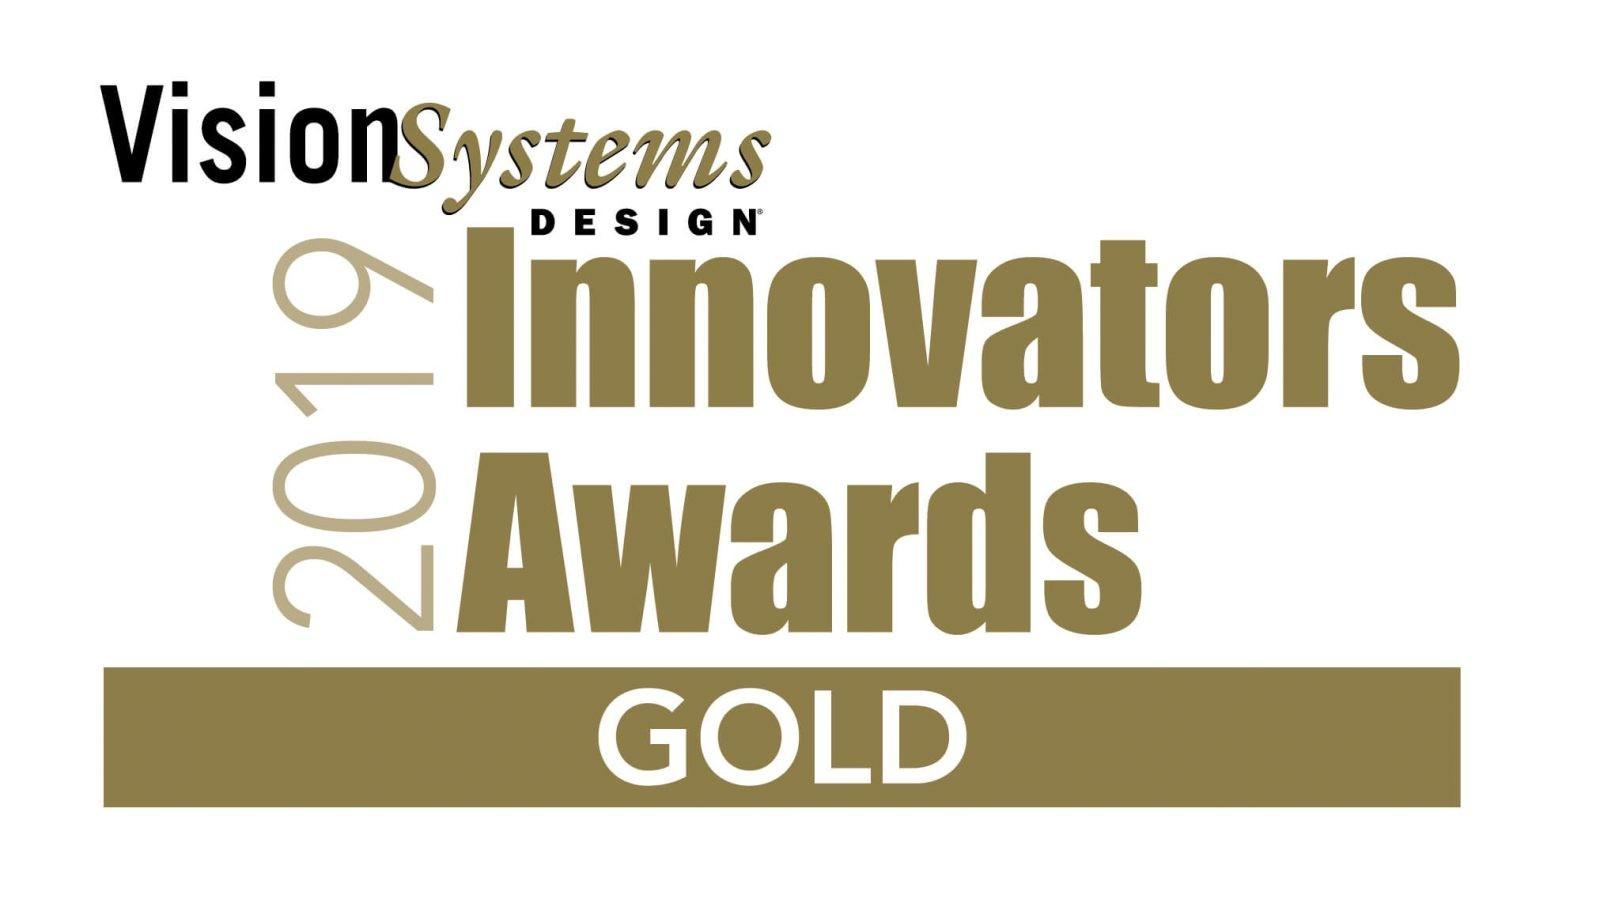 2019 innovators awards